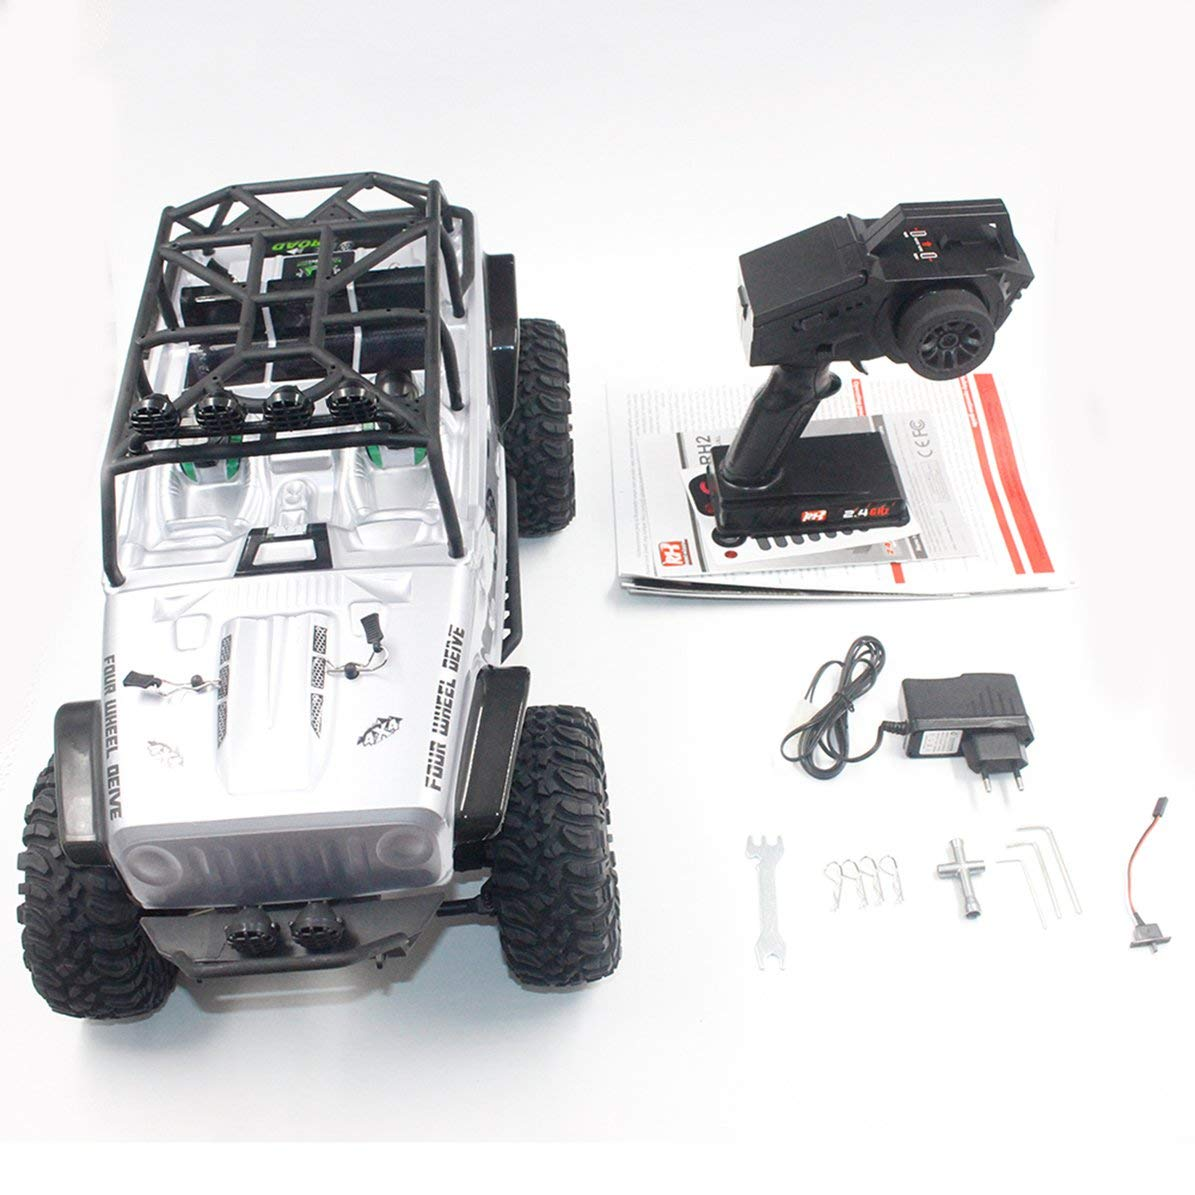 Corneliaa-UK Remo 1073-SJ 1 10 2.4GHz 550 Brushed RC Car Off-road Truck Rock Crawler Toys